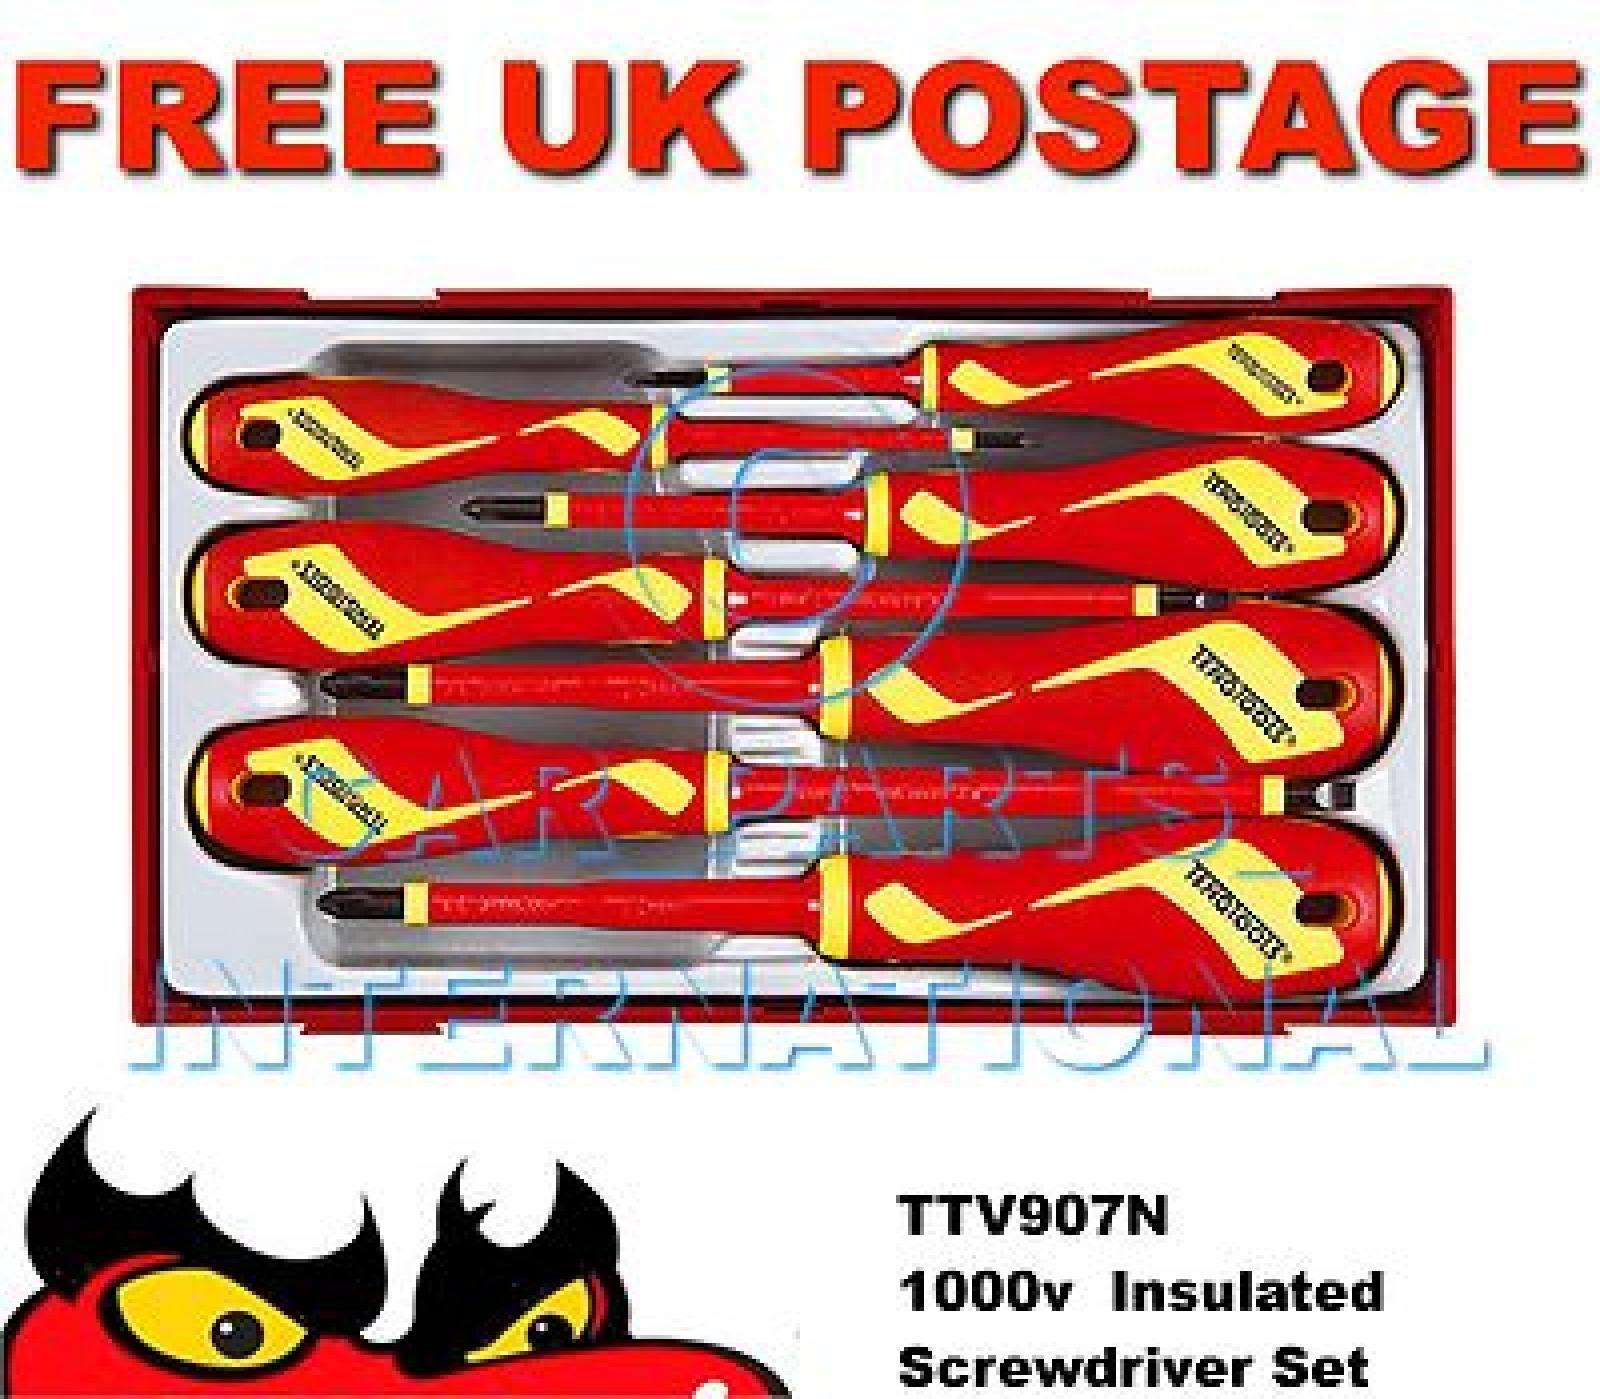 teng tools insulated screwdriver set 1000 volt electrician ttv907n ebay. Black Bedroom Furniture Sets. Home Design Ideas